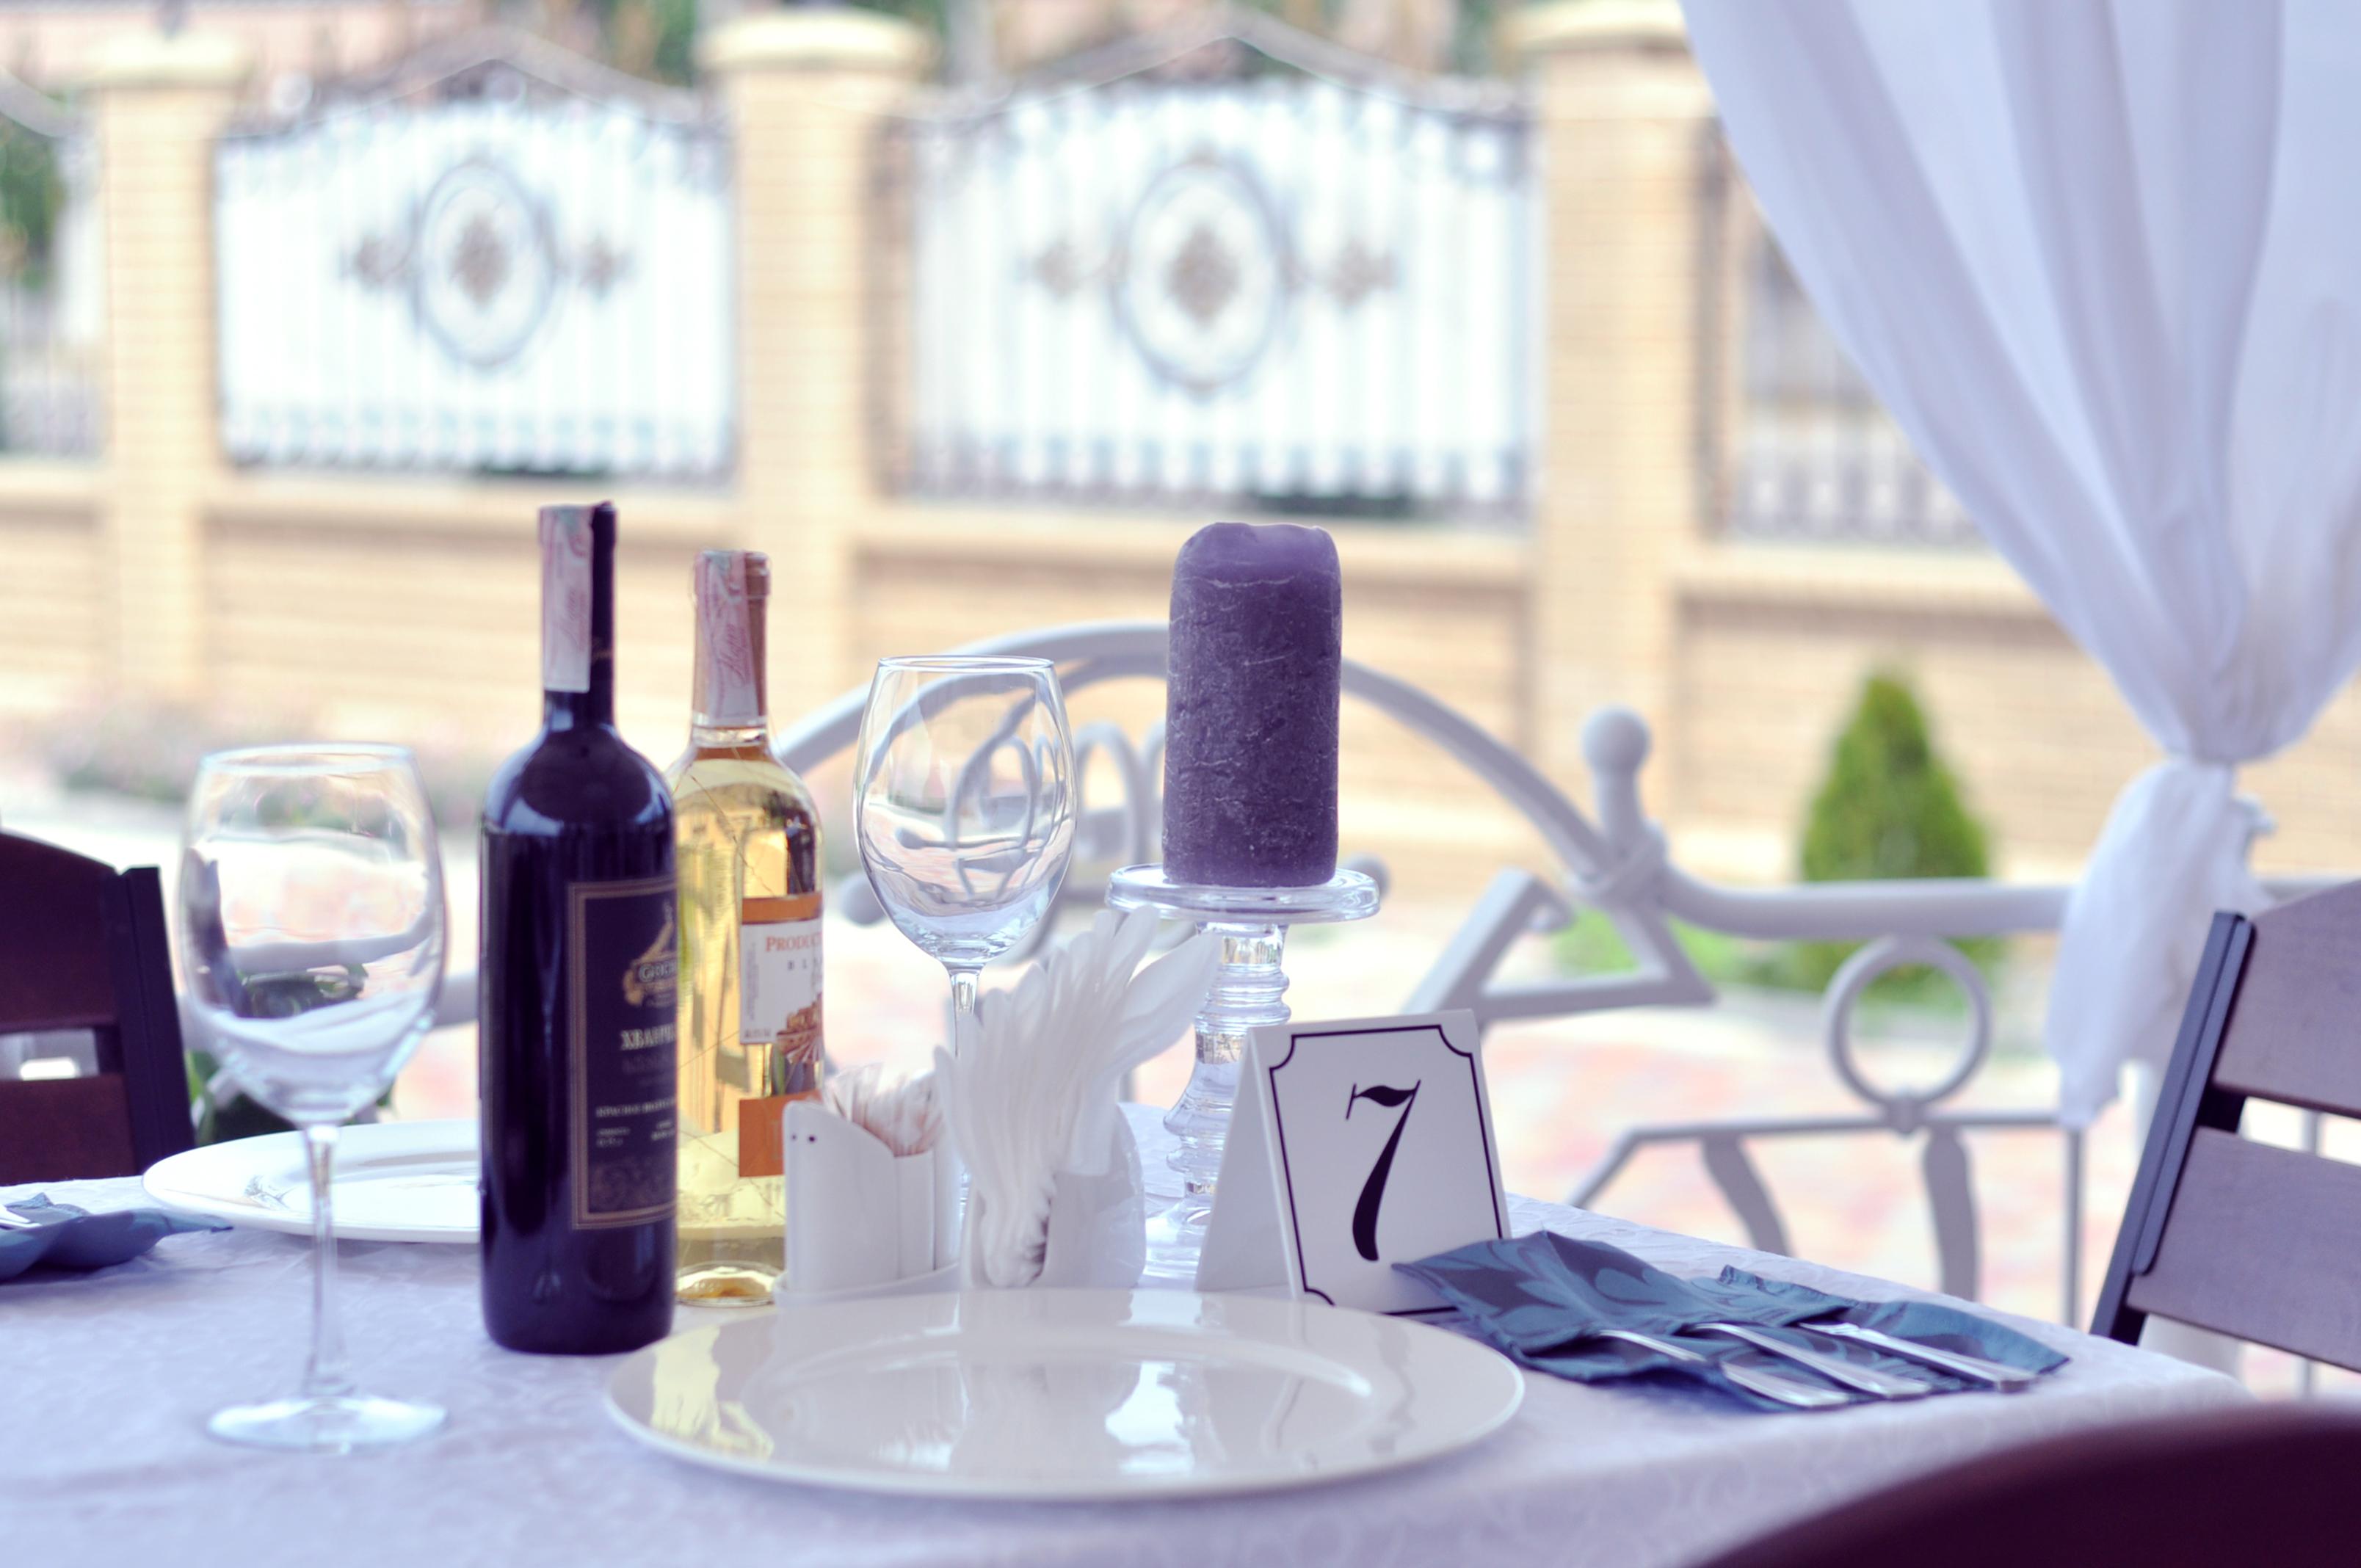 afina-hotel-restoran-berdjansk-4